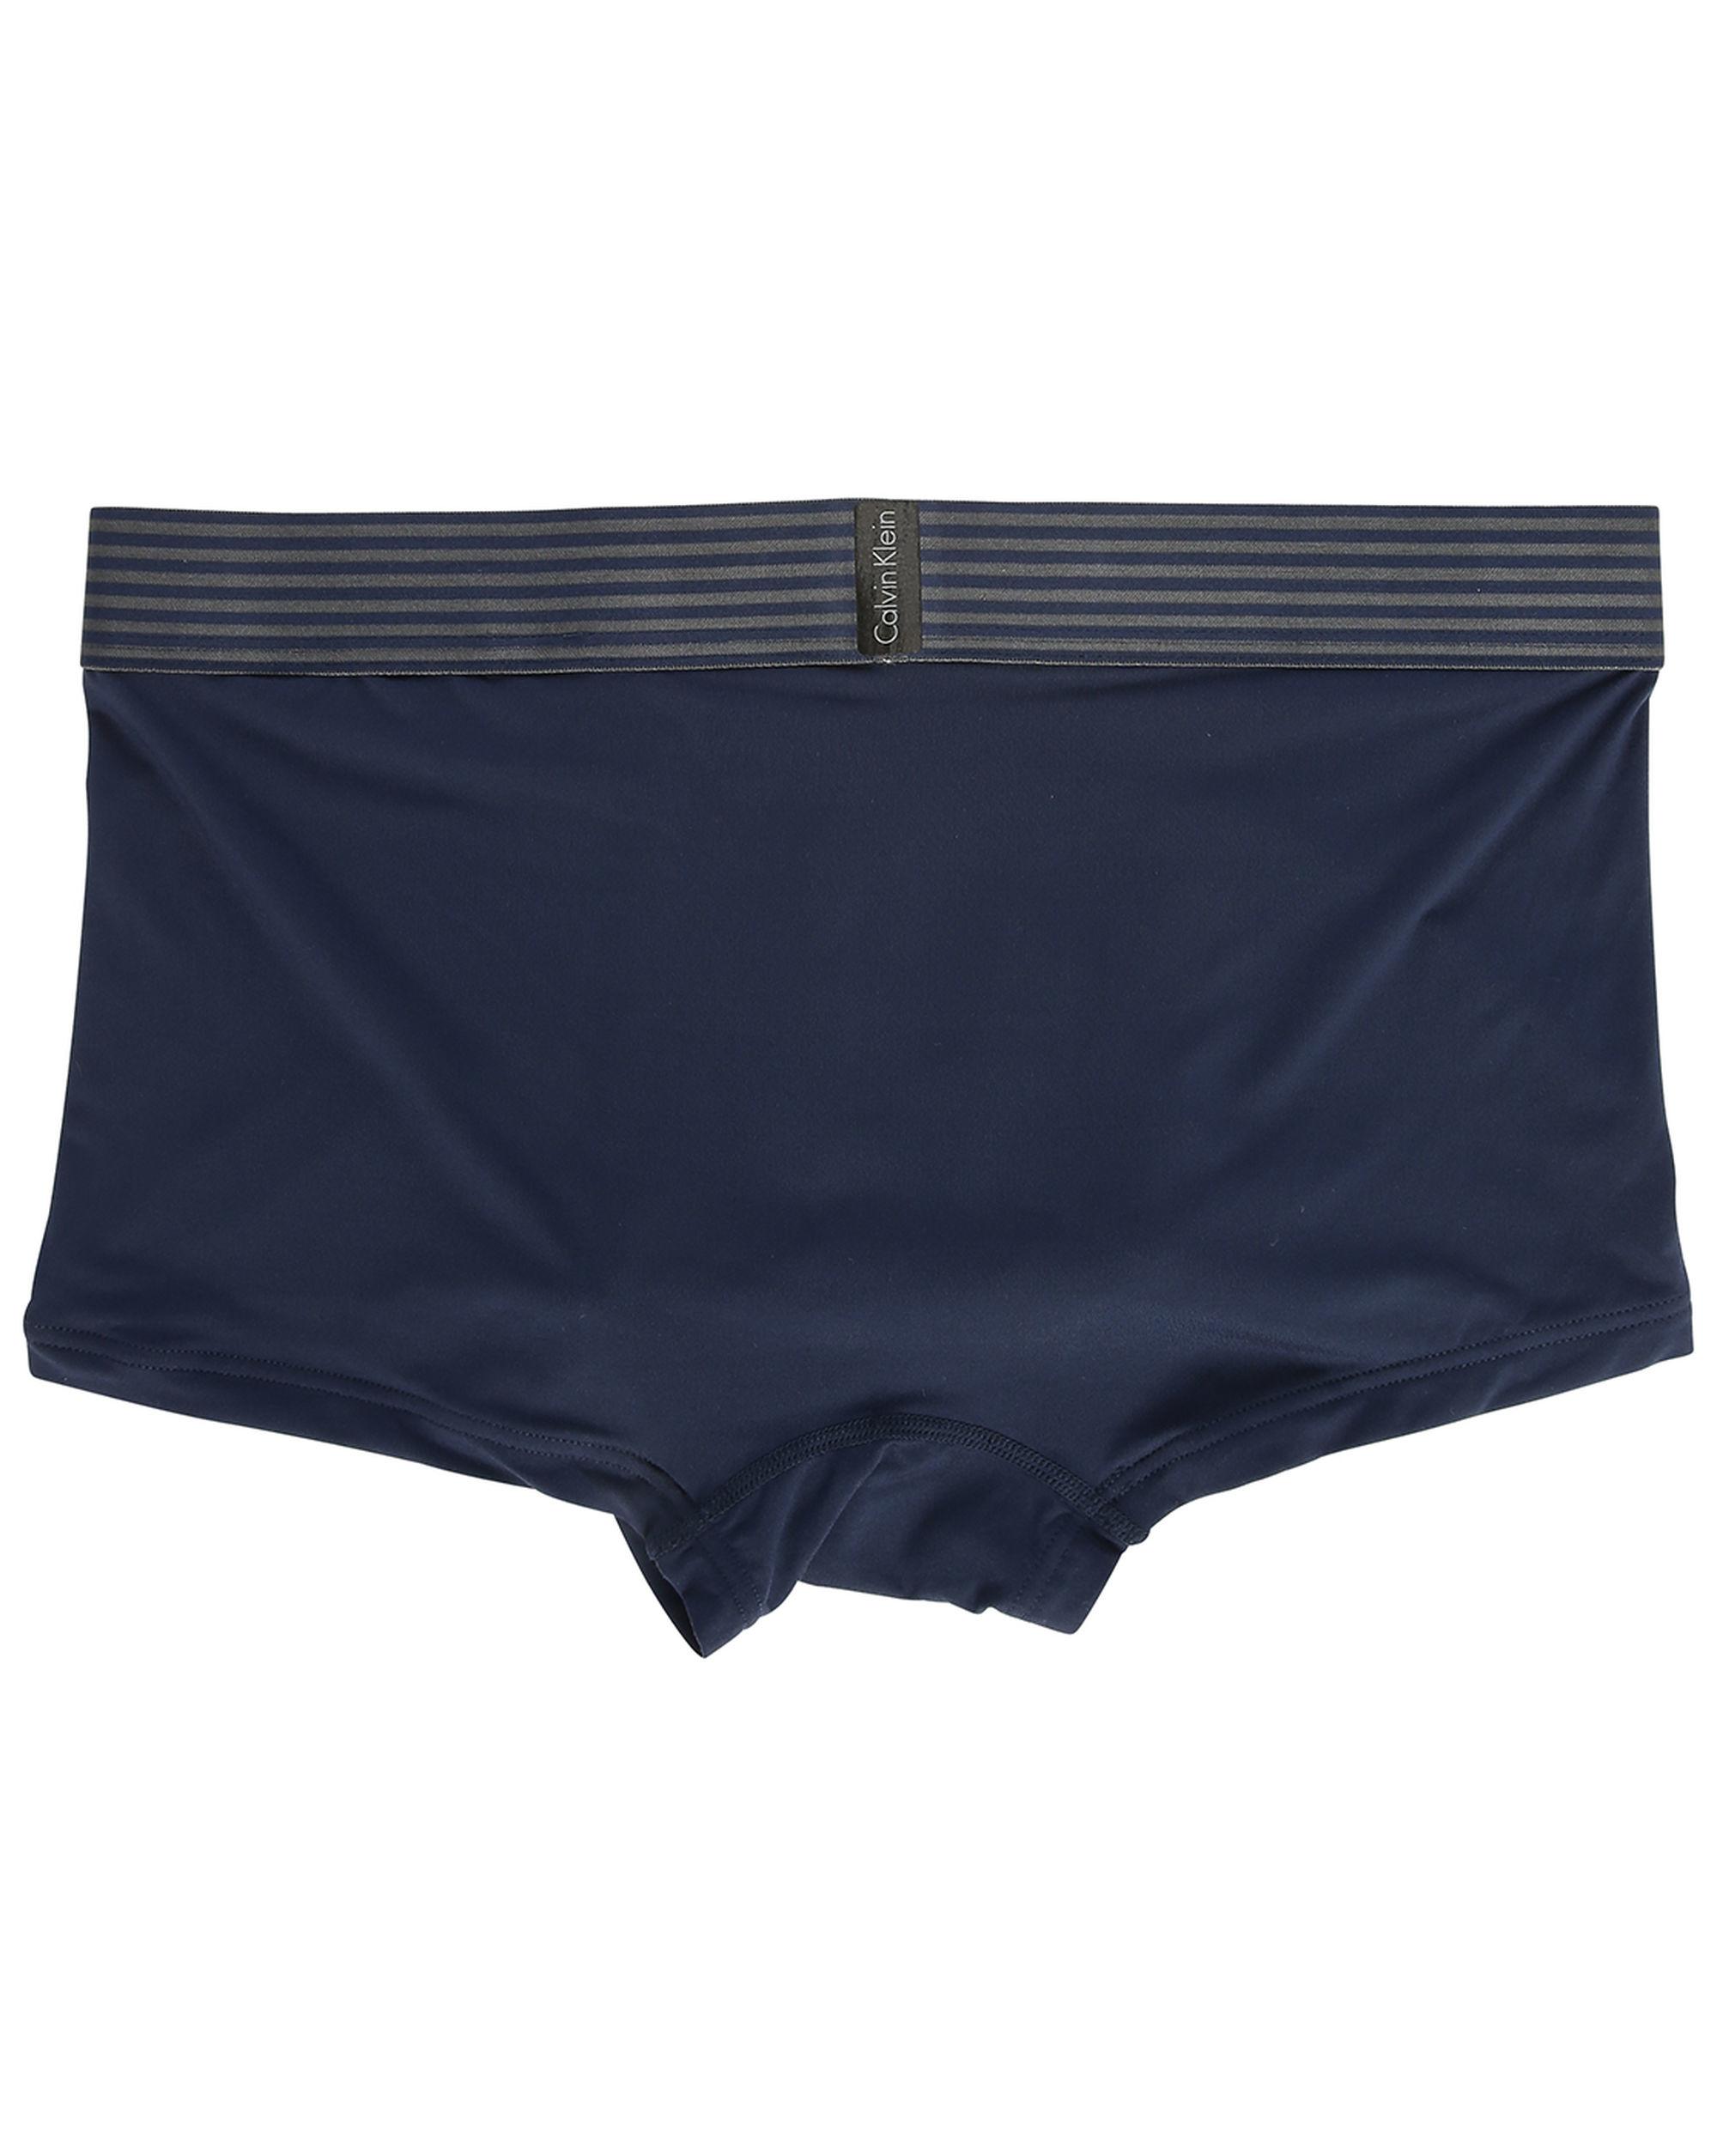 calvin klein navy microfibre boxer shorts in blue for men. Black Bedroom Furniture Sets. Home Design Ideas